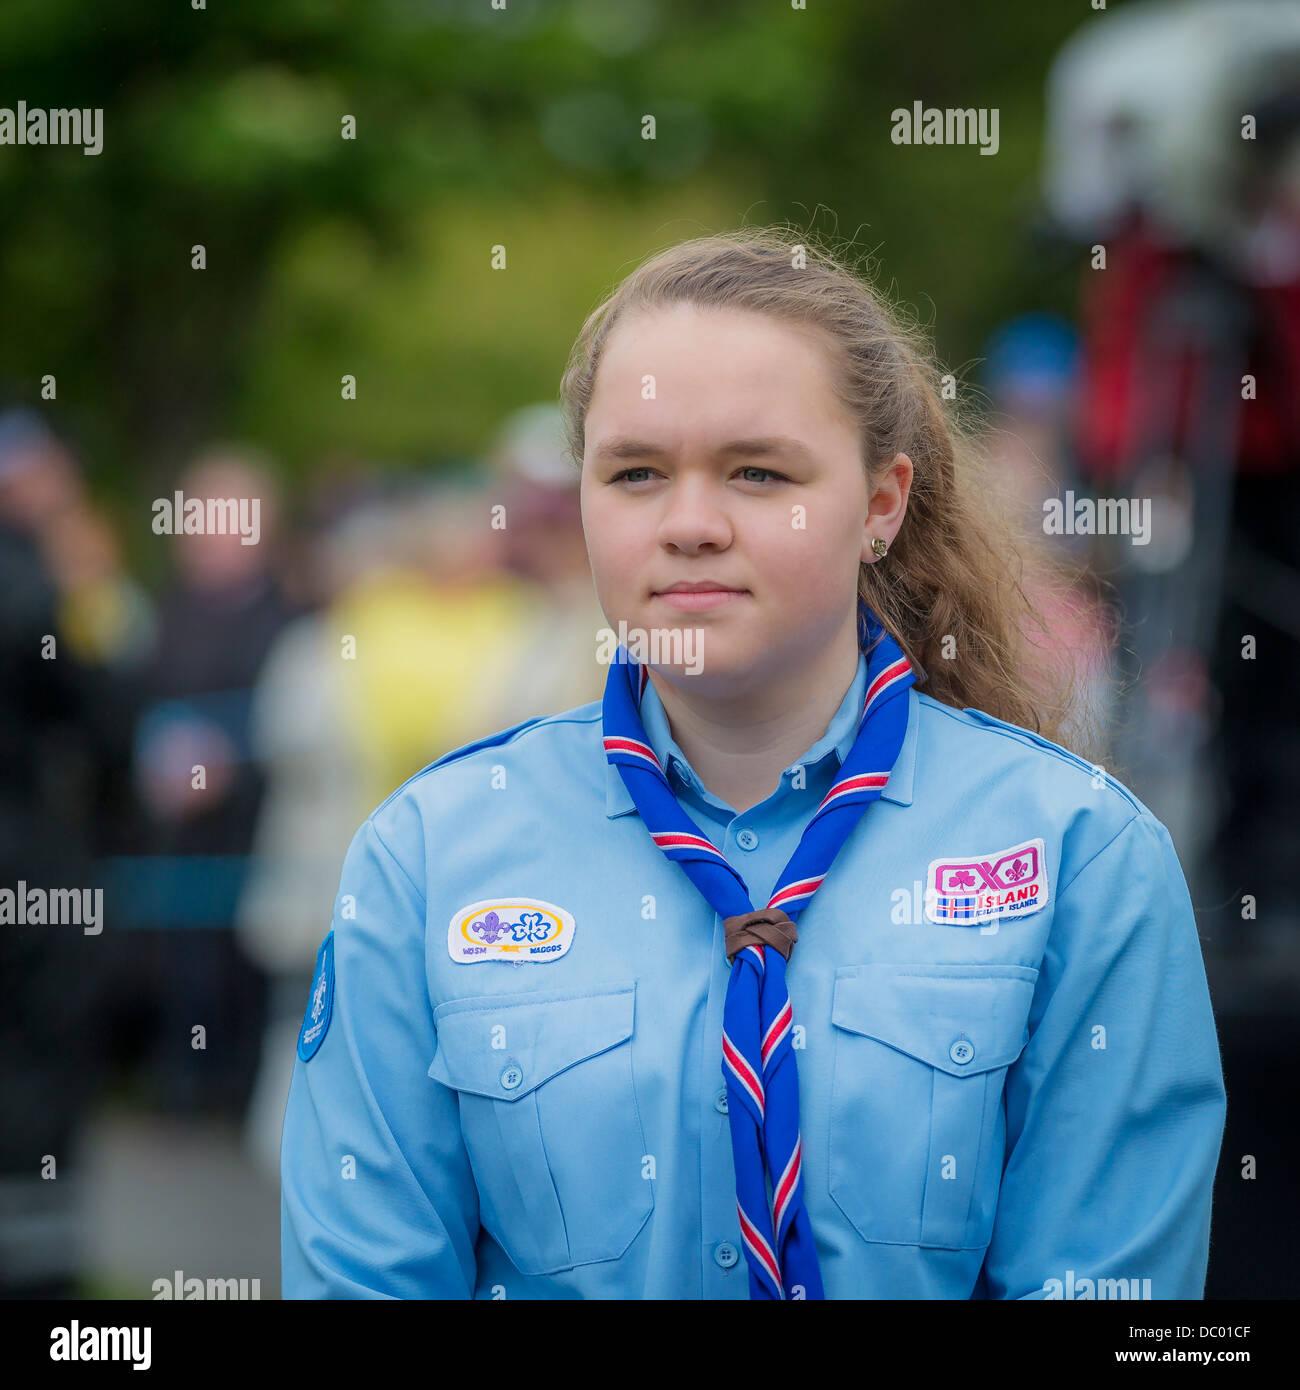 Portrait of Icelandic Girl Scout, Reykjavik, Iceland - Stock Image